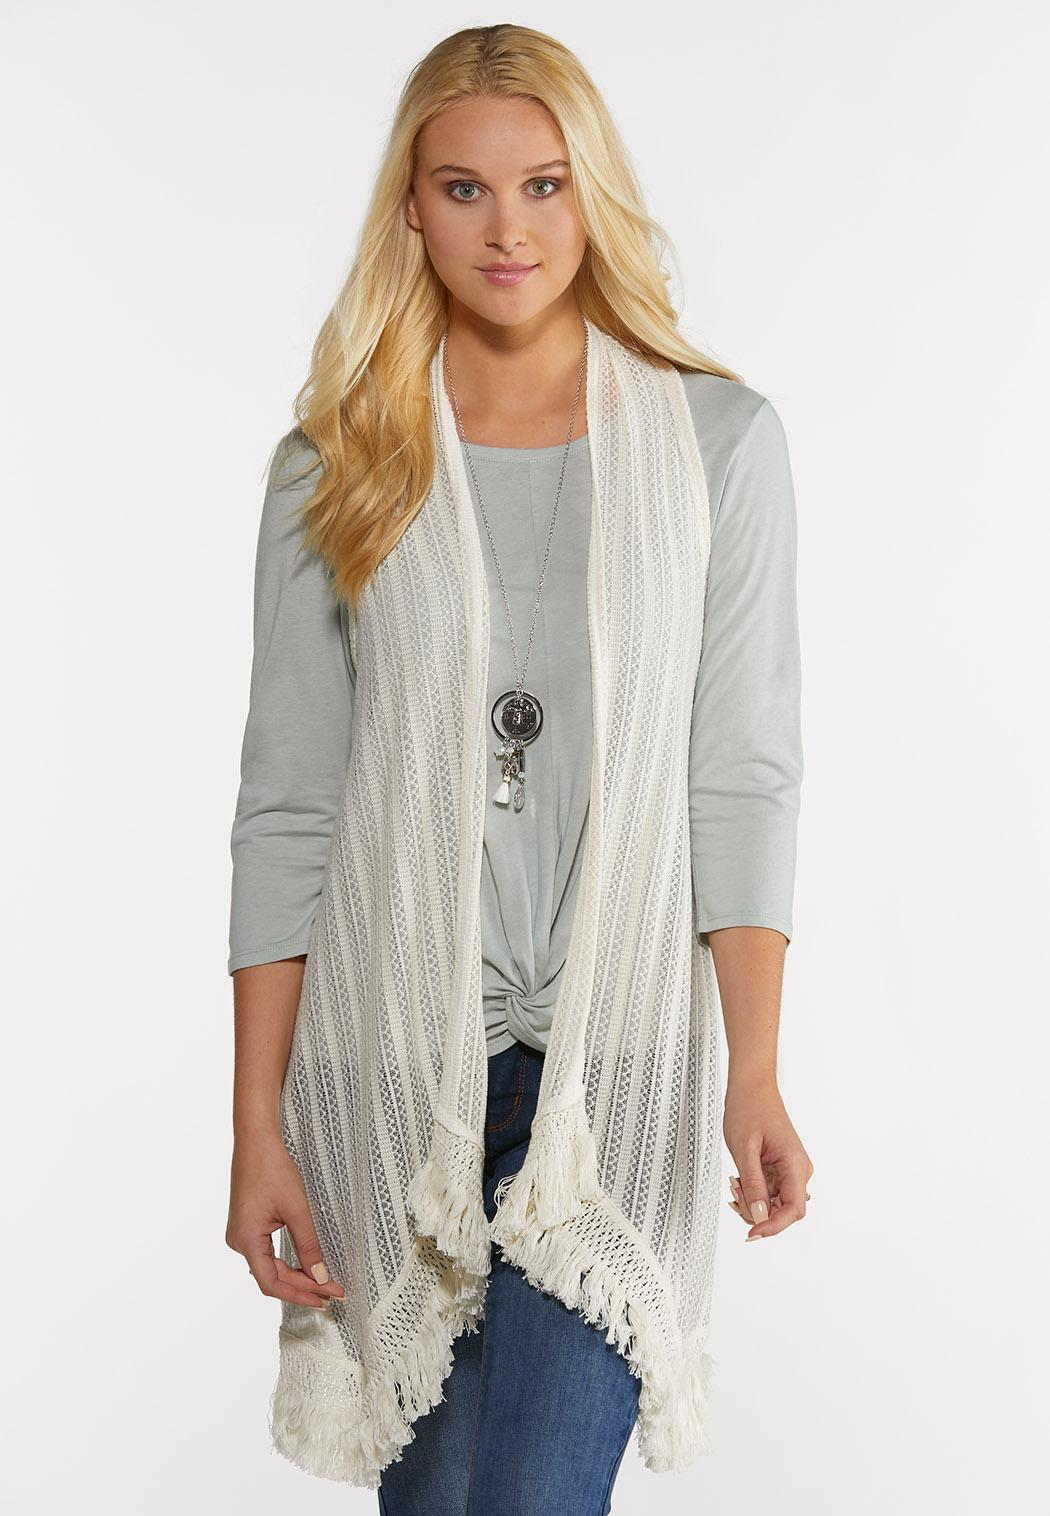 Ivory Fringe Vest